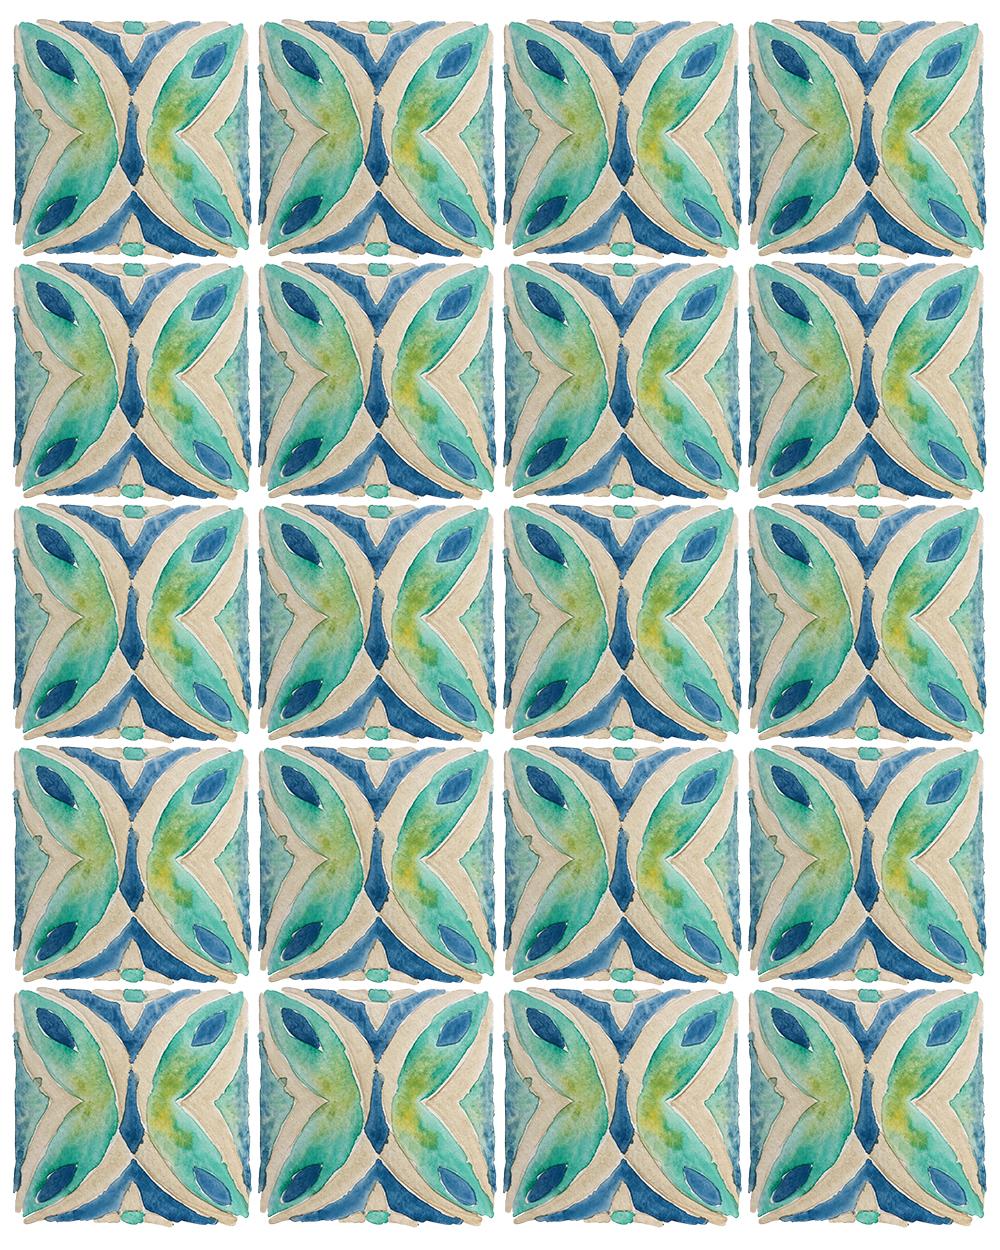 mexica-watercolor-tiles-pattern-02.jpg